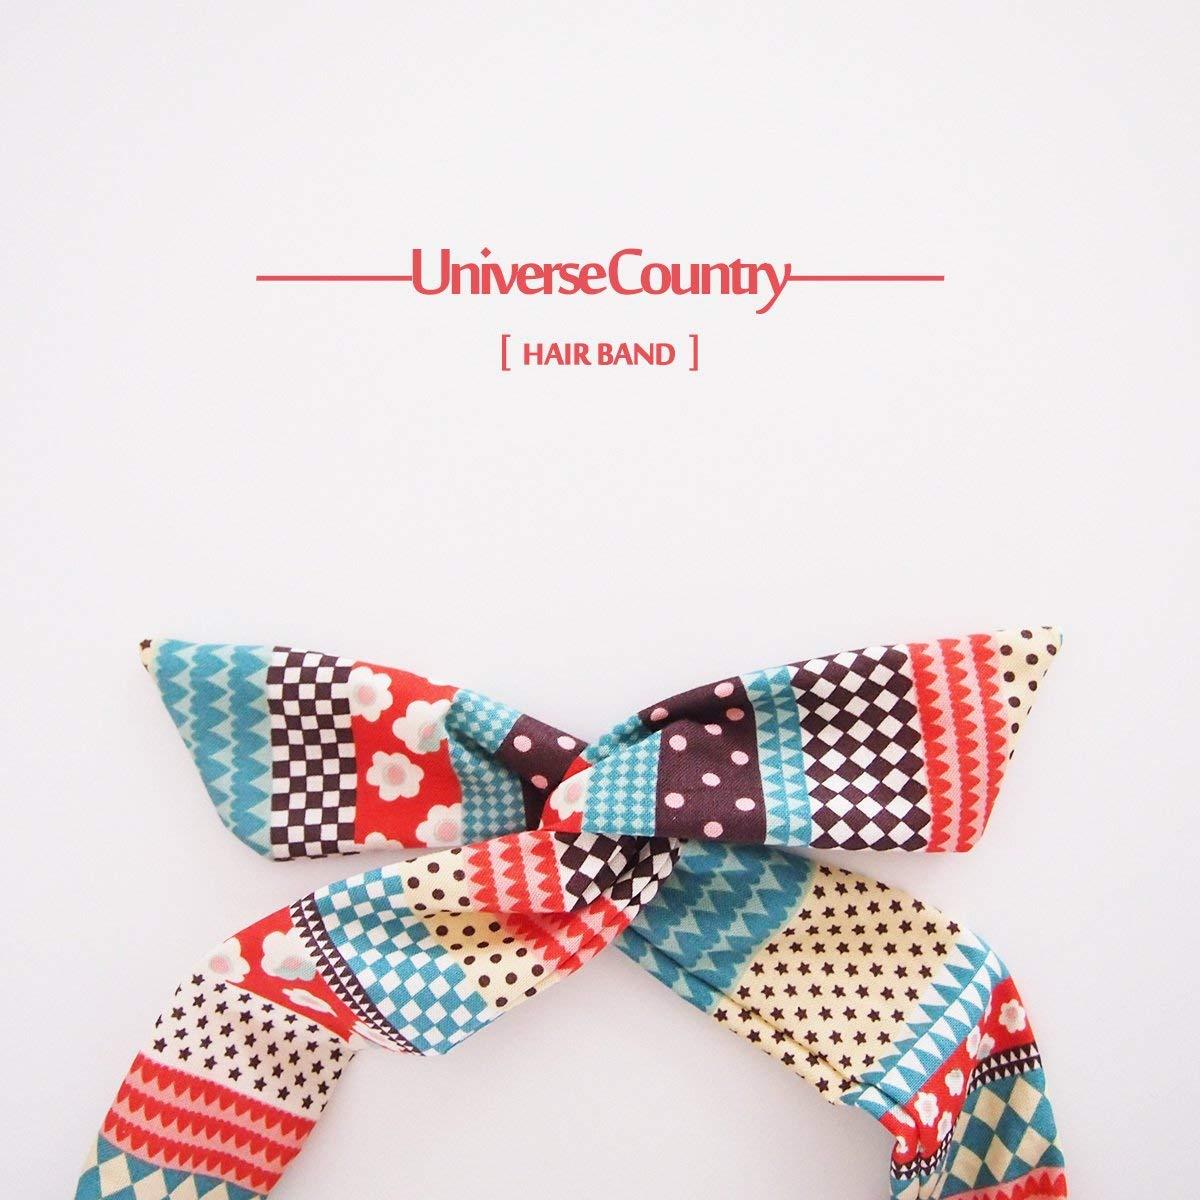 usongs Spot custom sold out does not help little flower hair band Patchwork - original design handmade